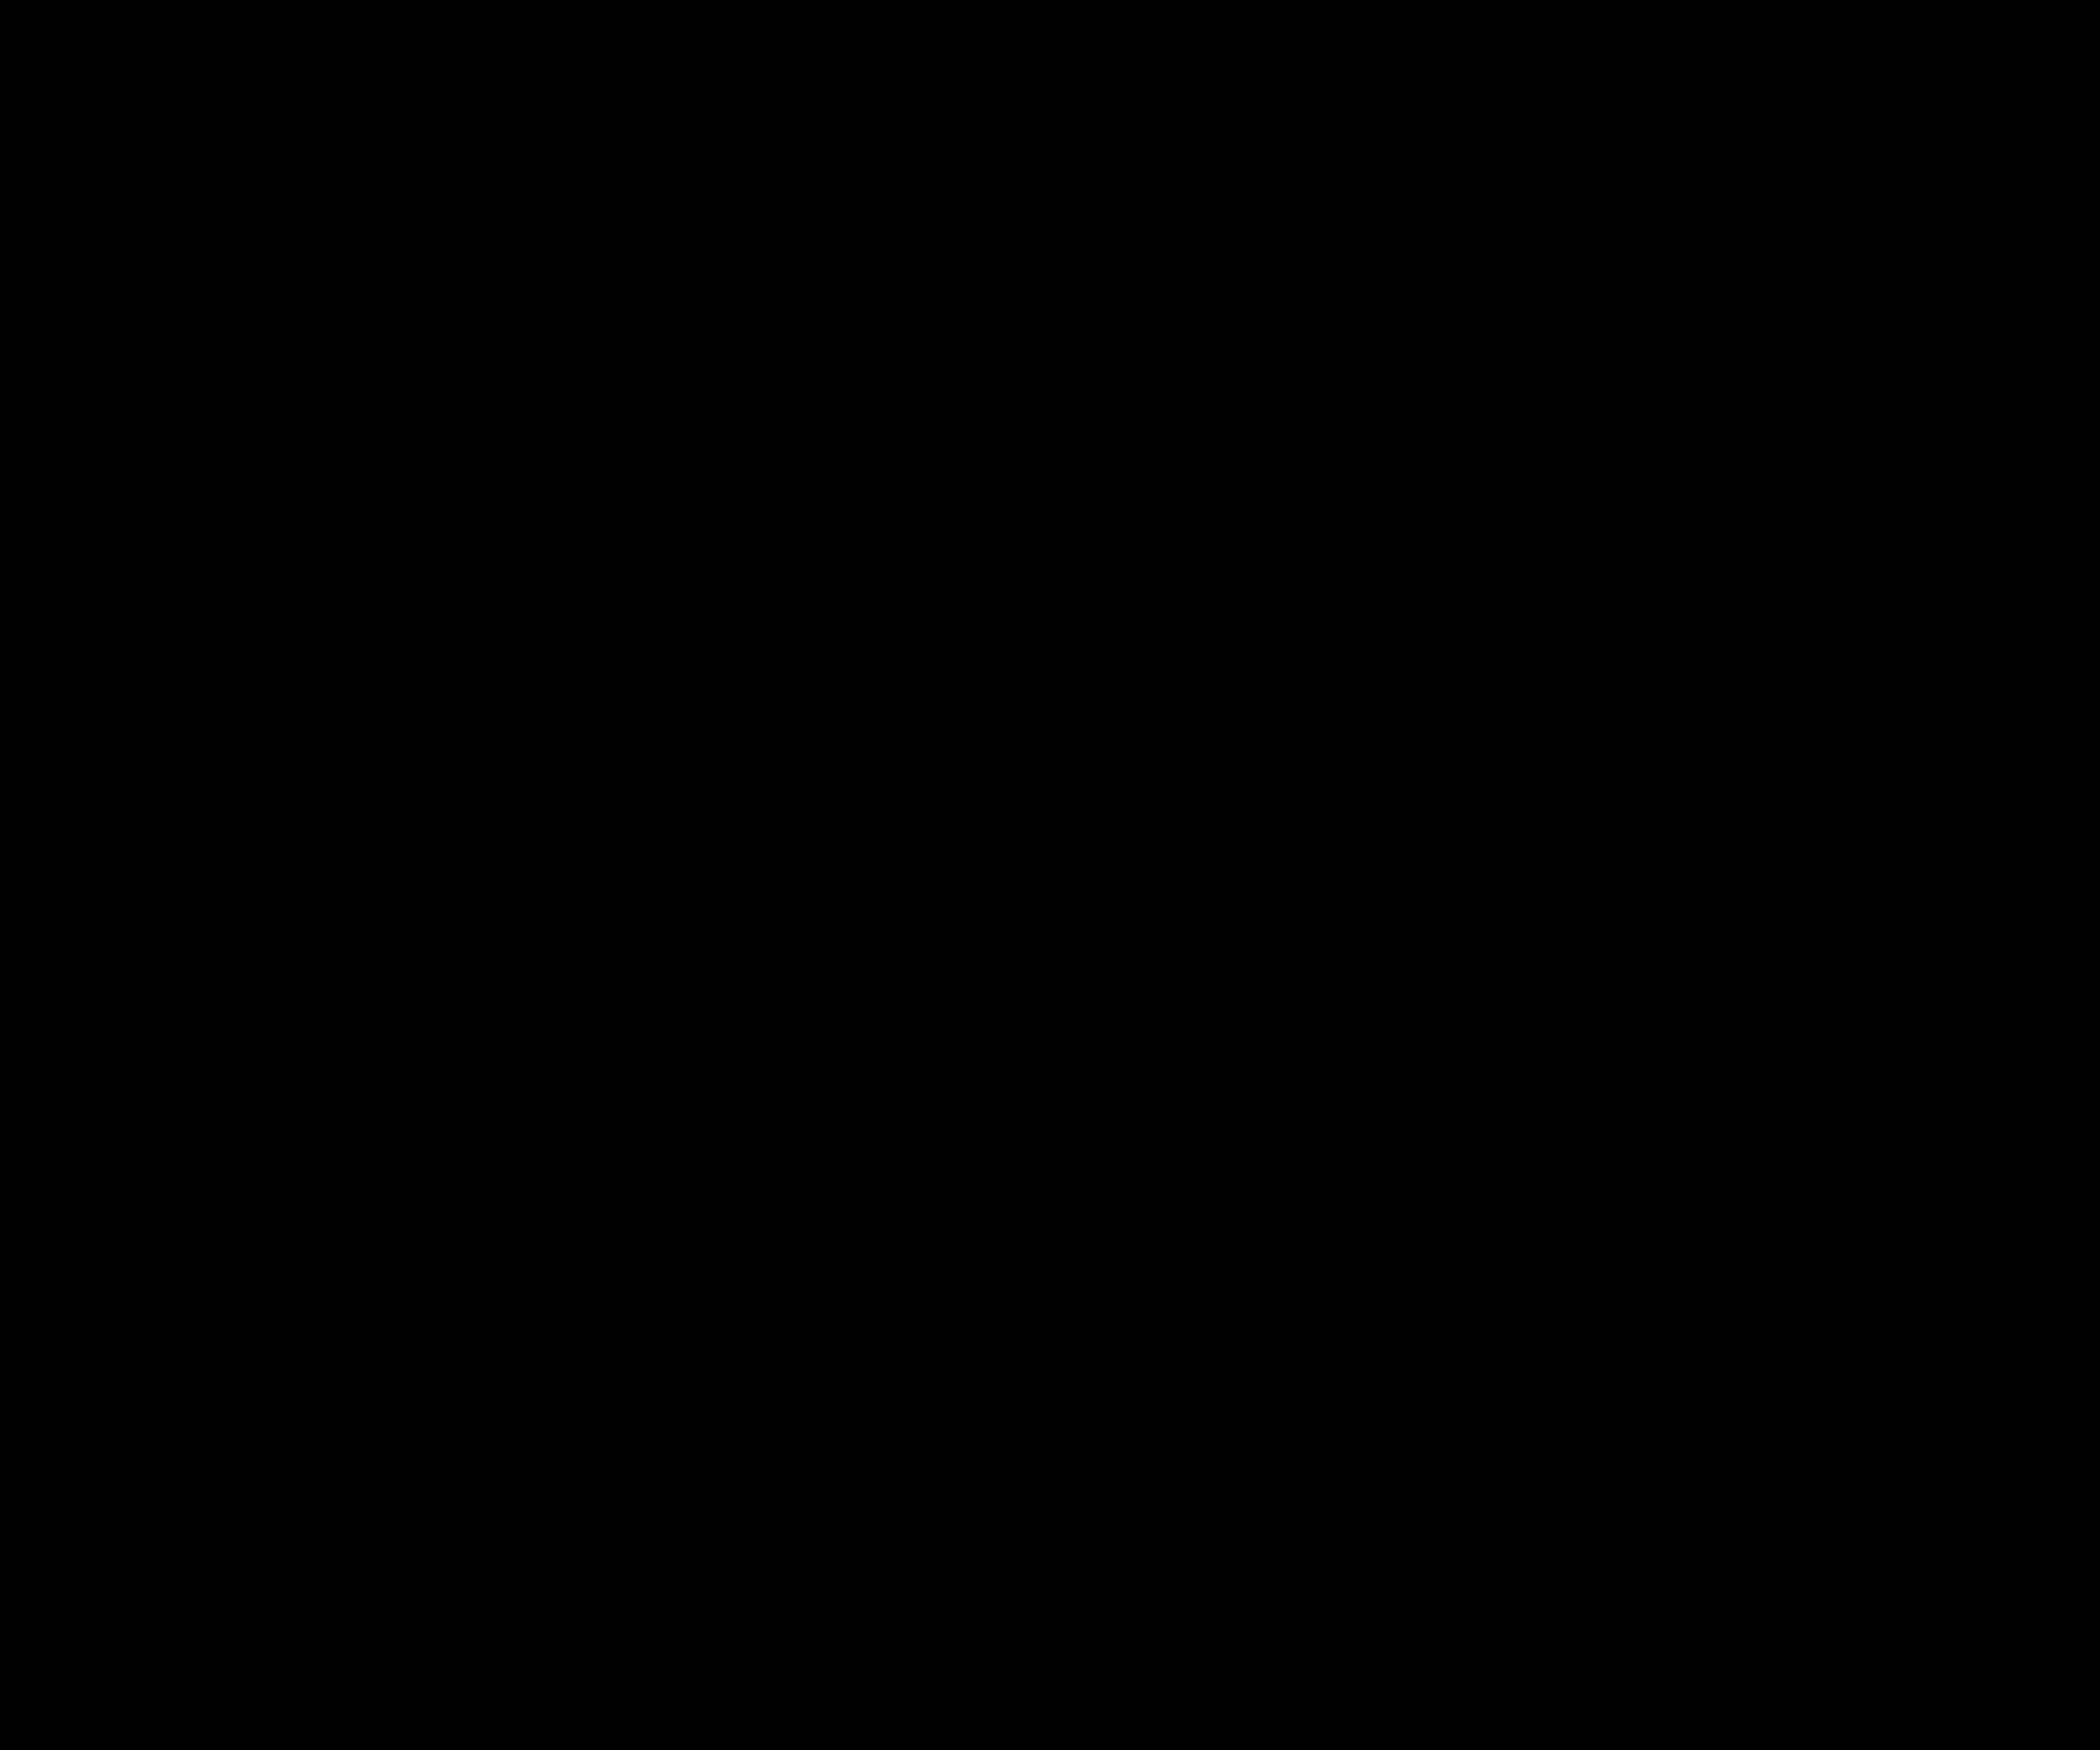 2400x2000 Clip Art Pig Clip Art Outline